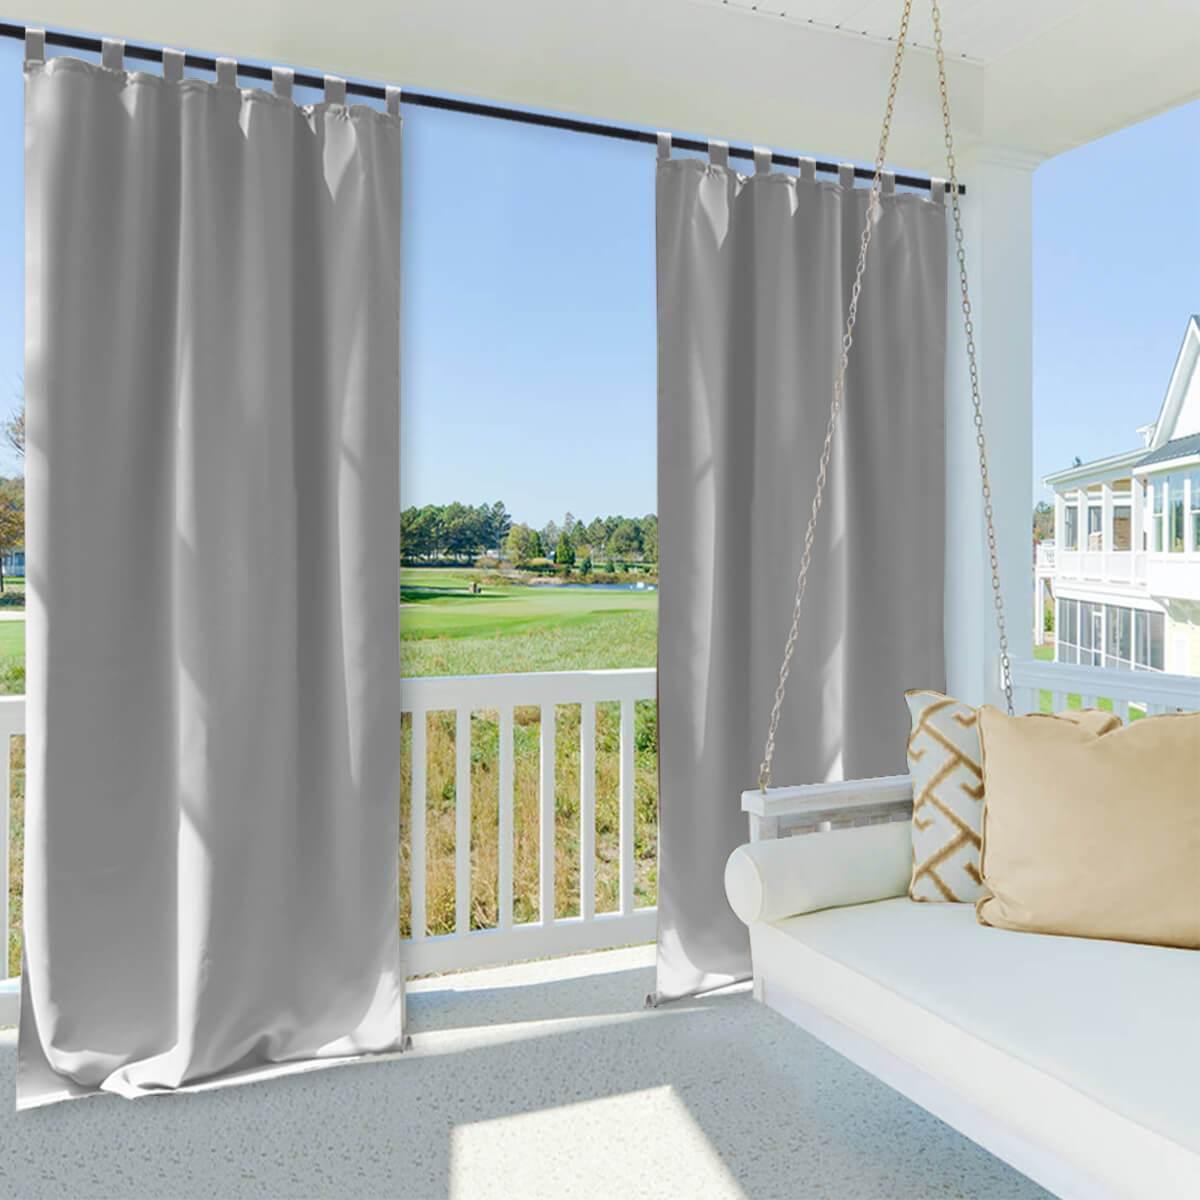 SnowCity outdoor waterproof curtains